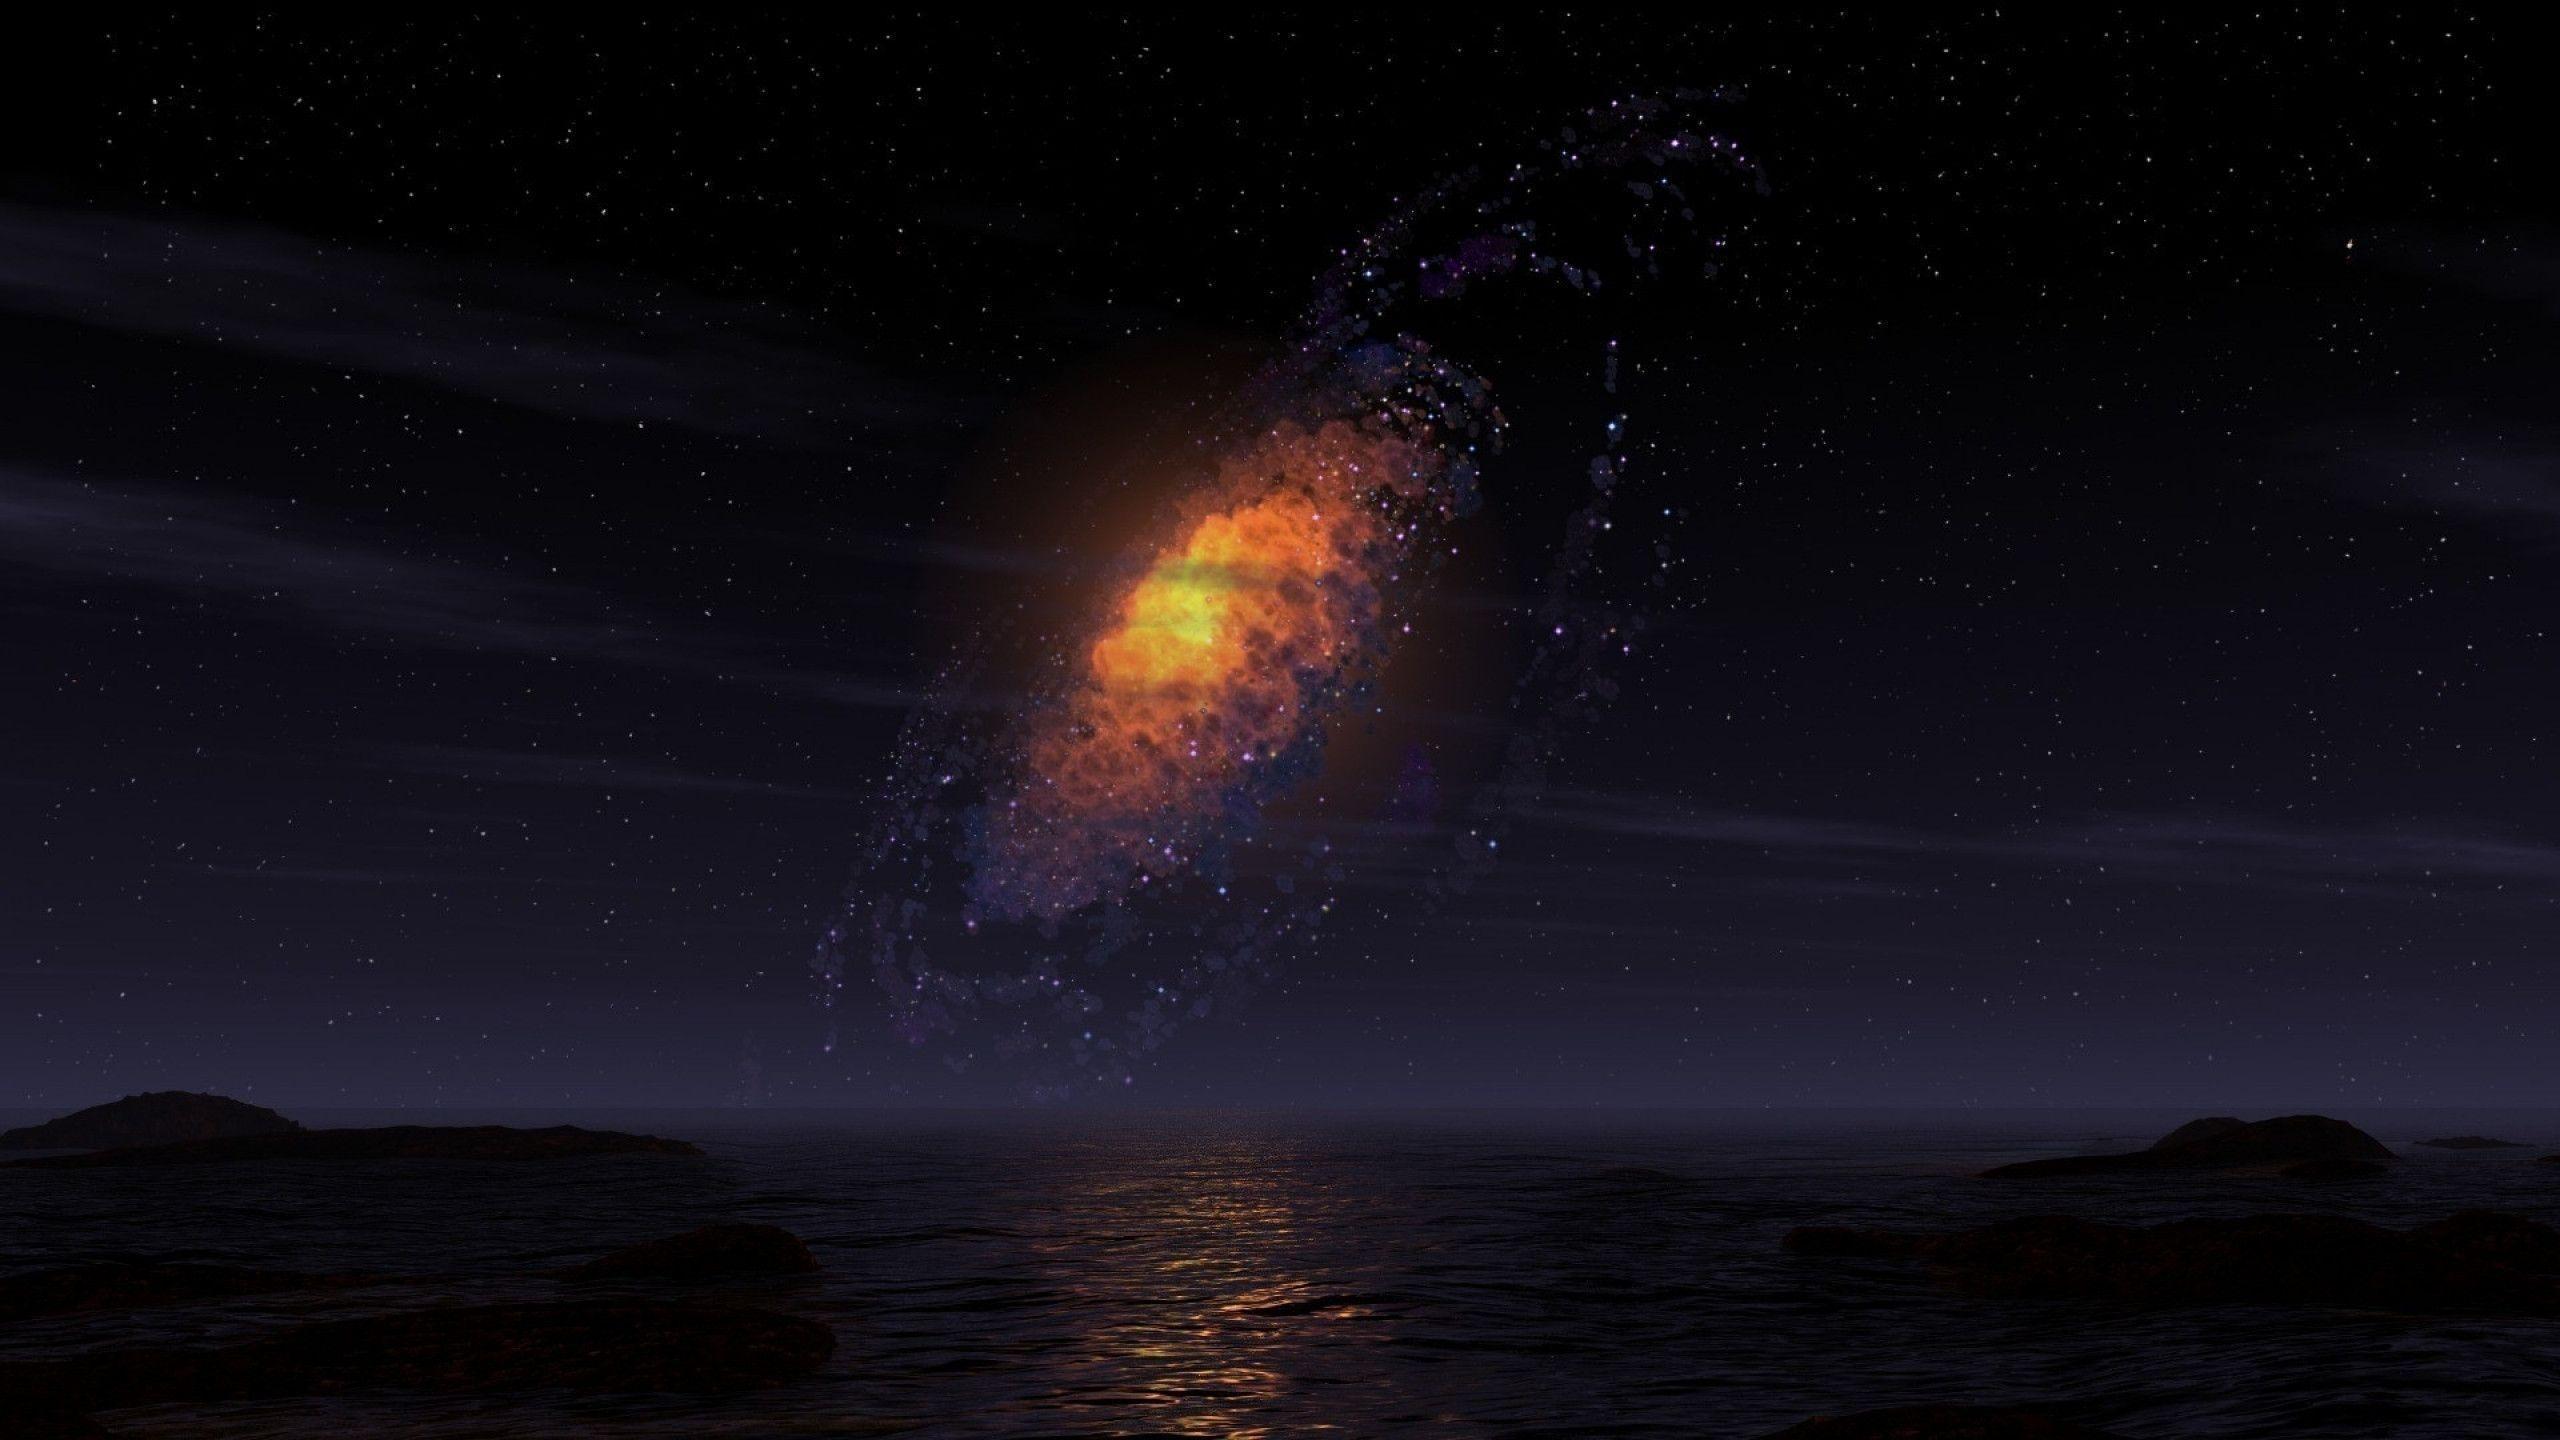 supernova desktop wallpaper - photo #17